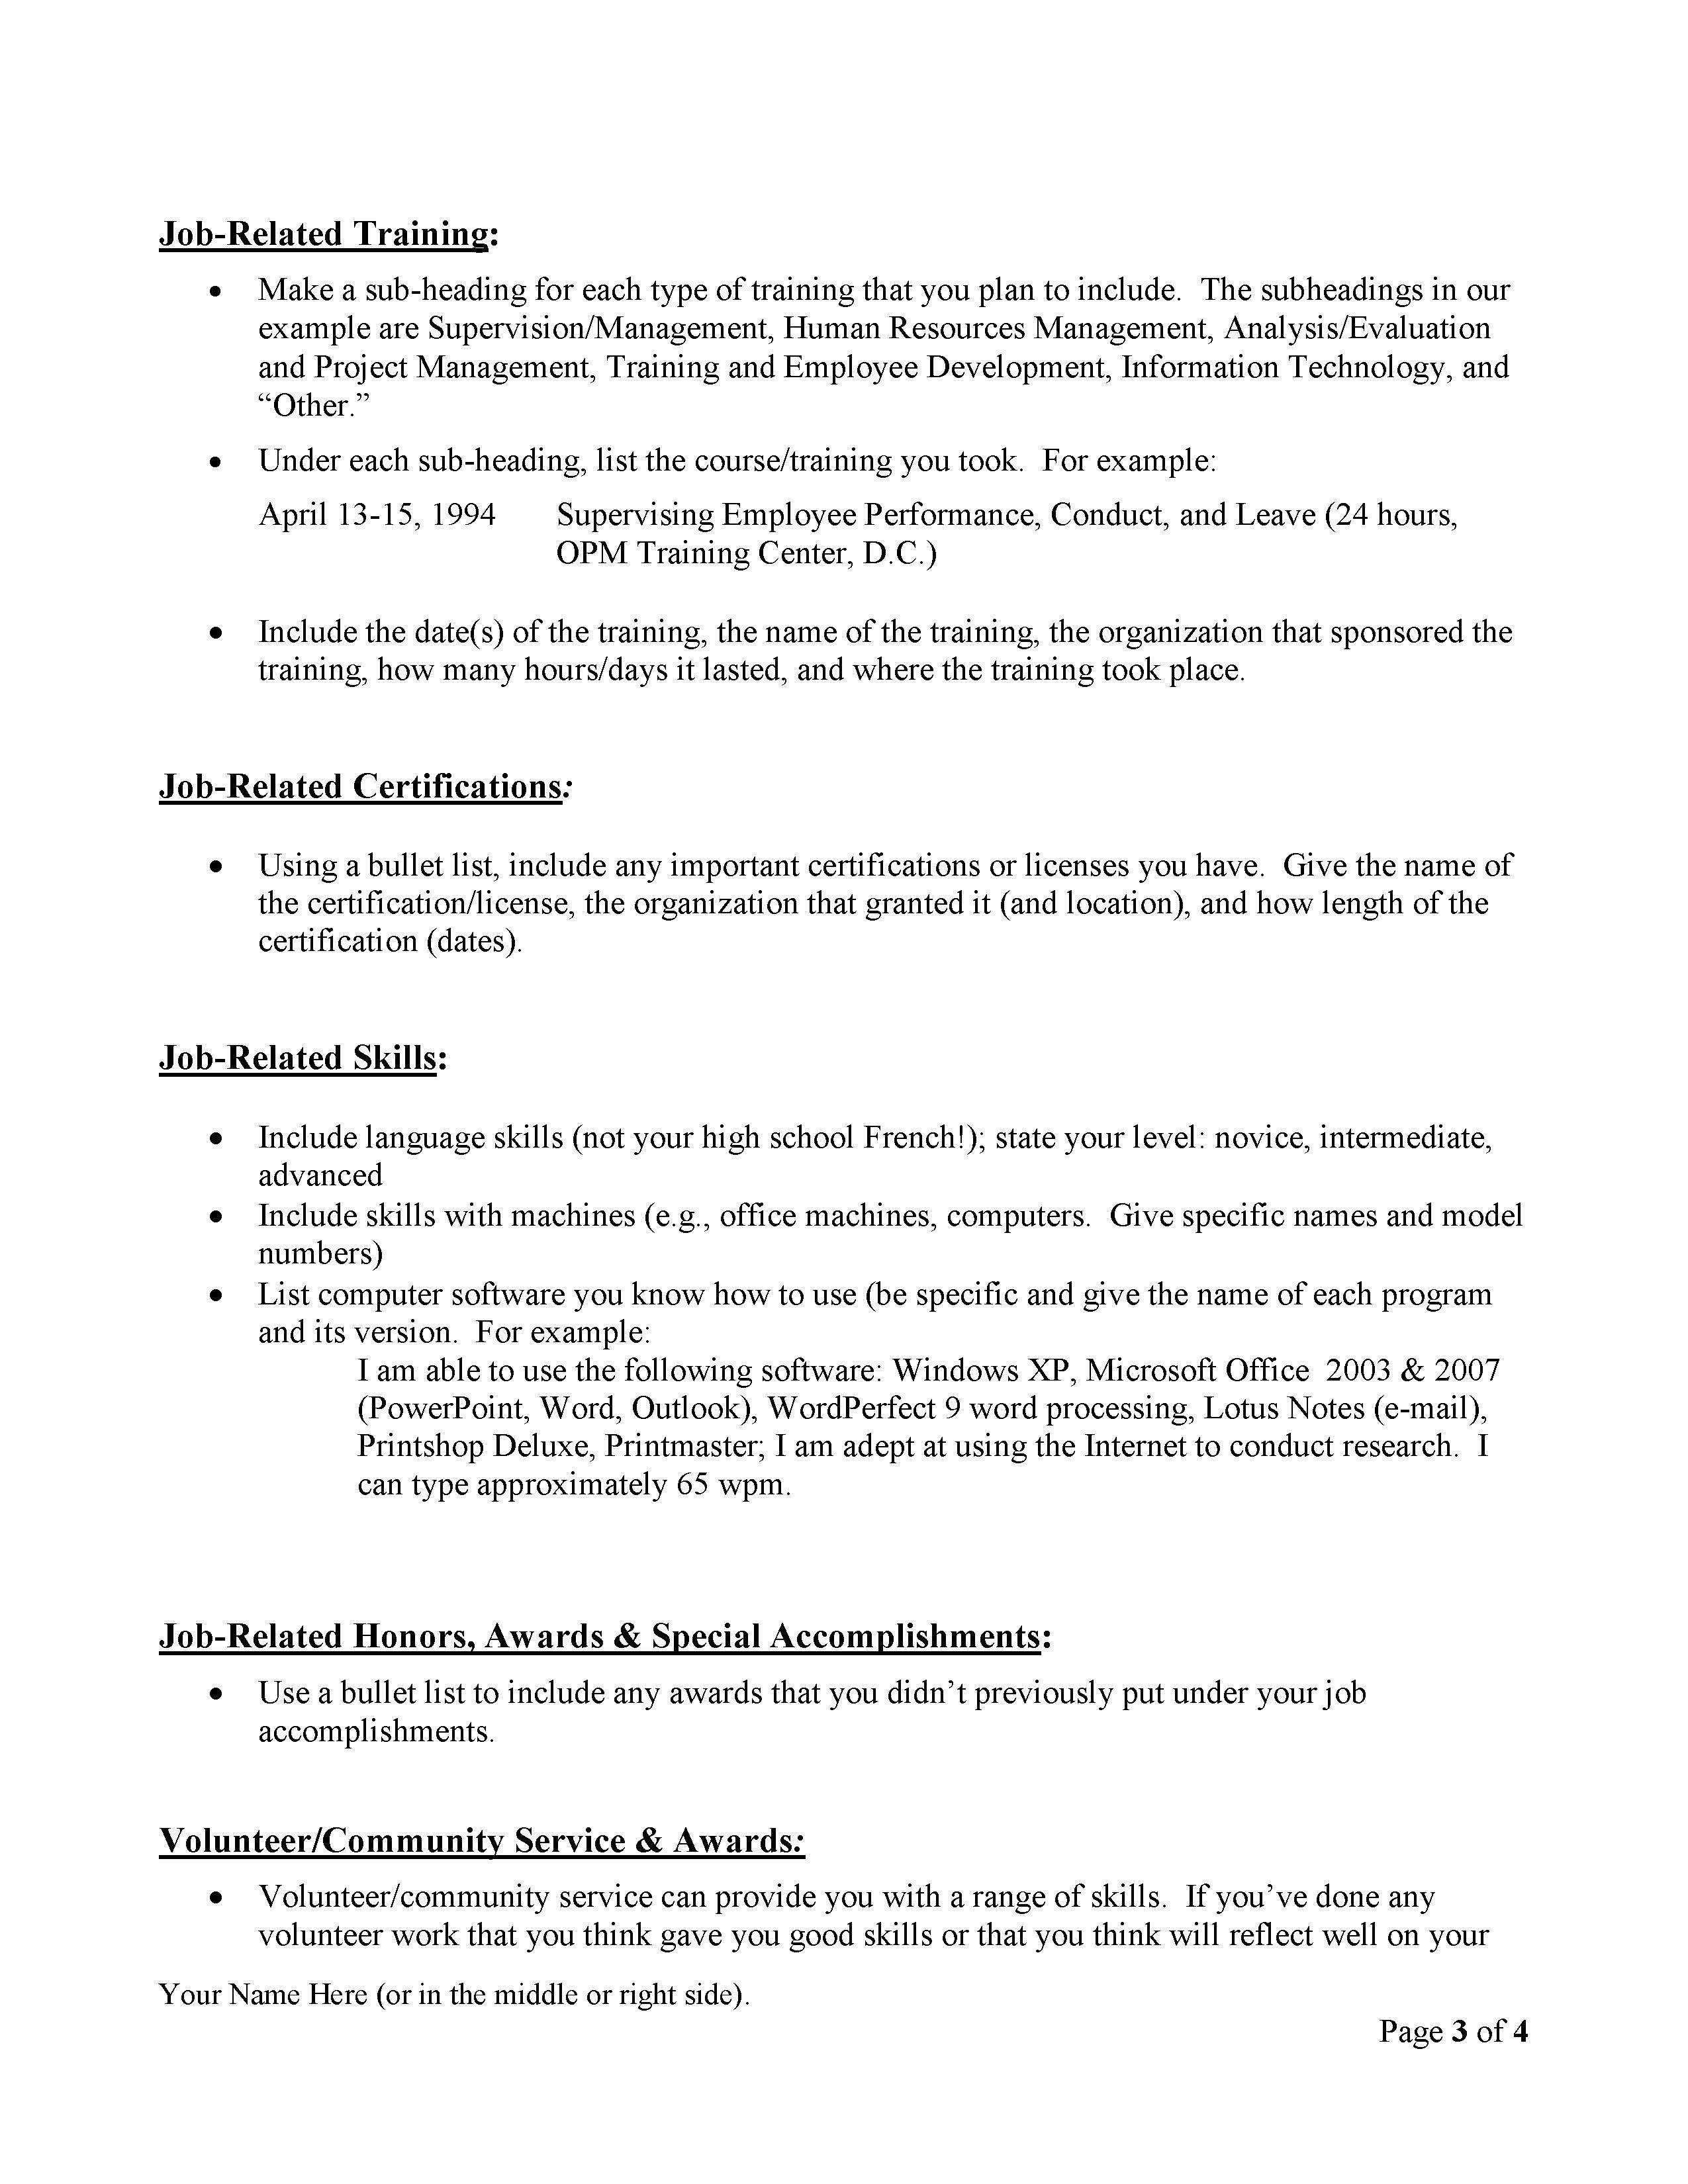 Resume Templates Drive ResumeTemplates